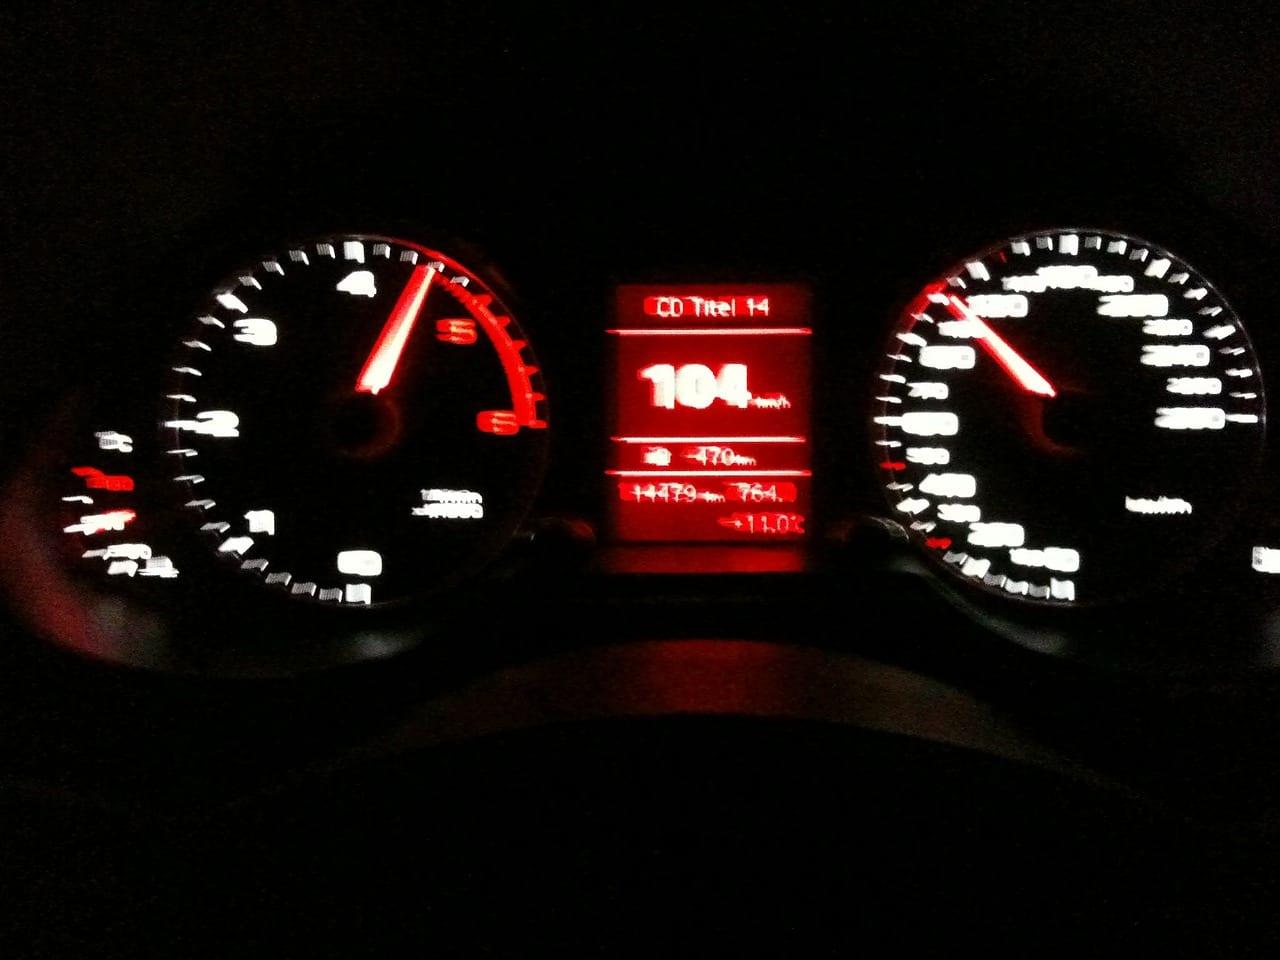 speeding driving